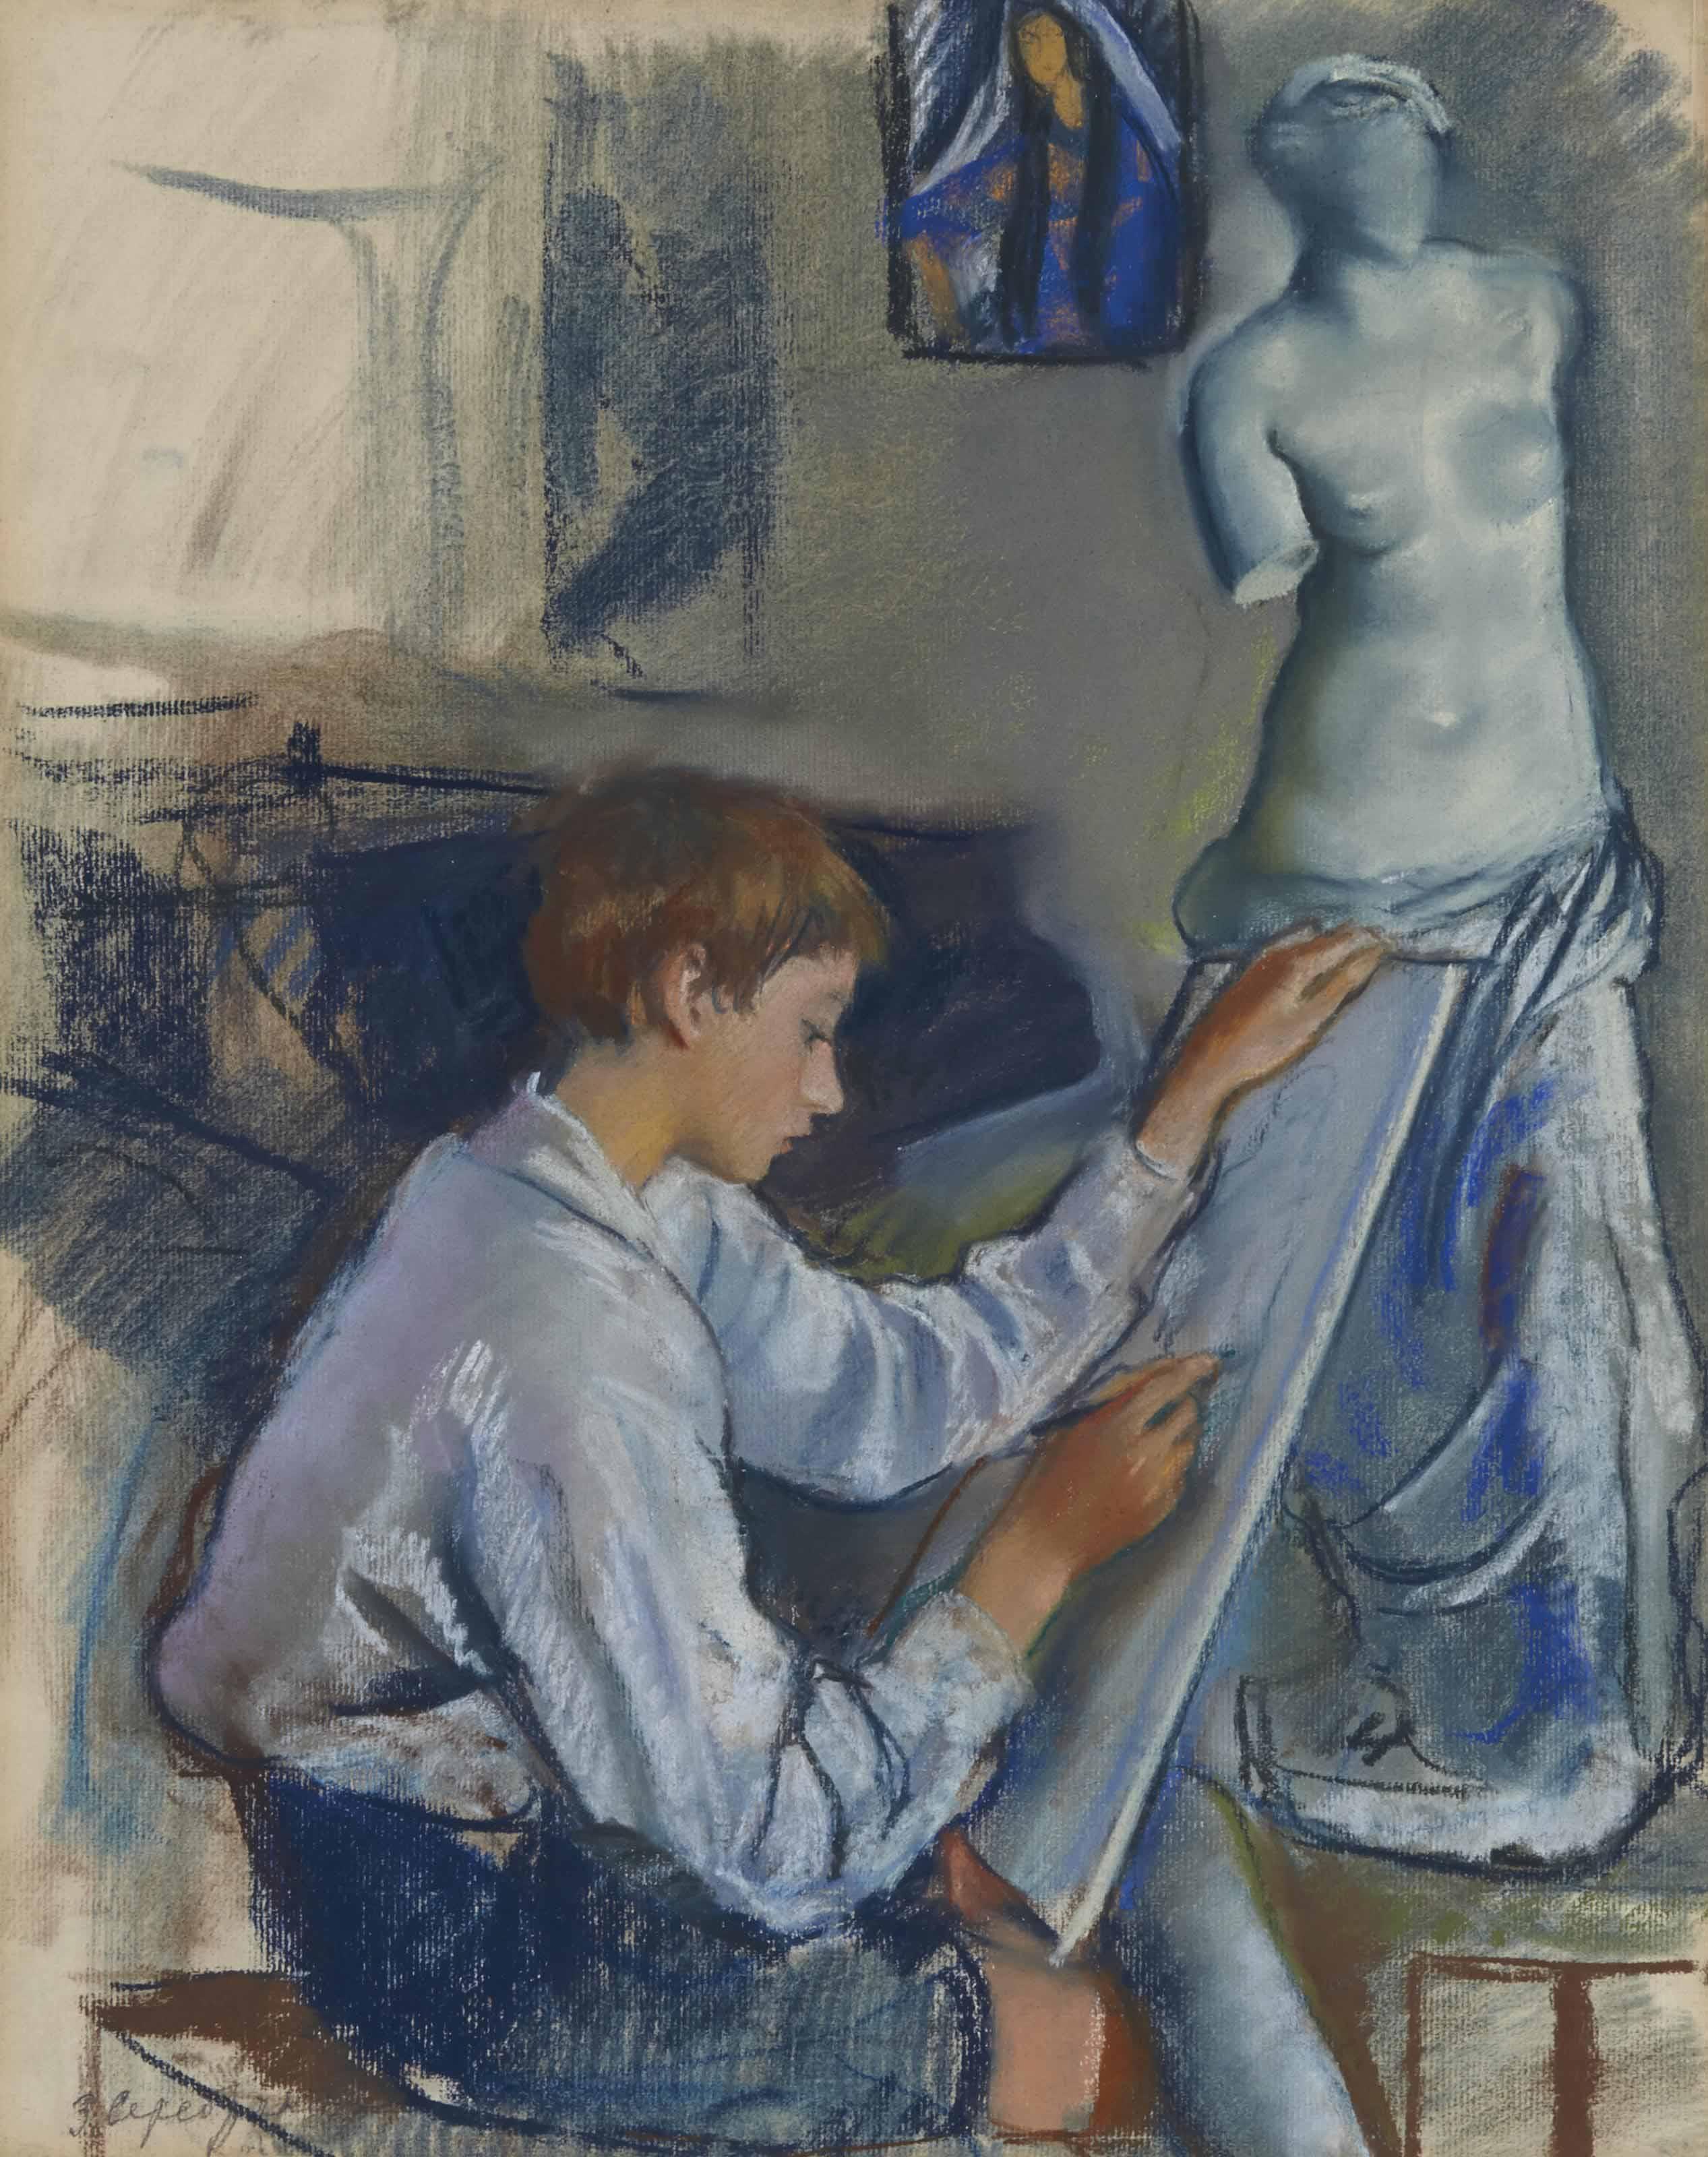 Portrait of the artist's son Alexandre sketching in the artist's studio